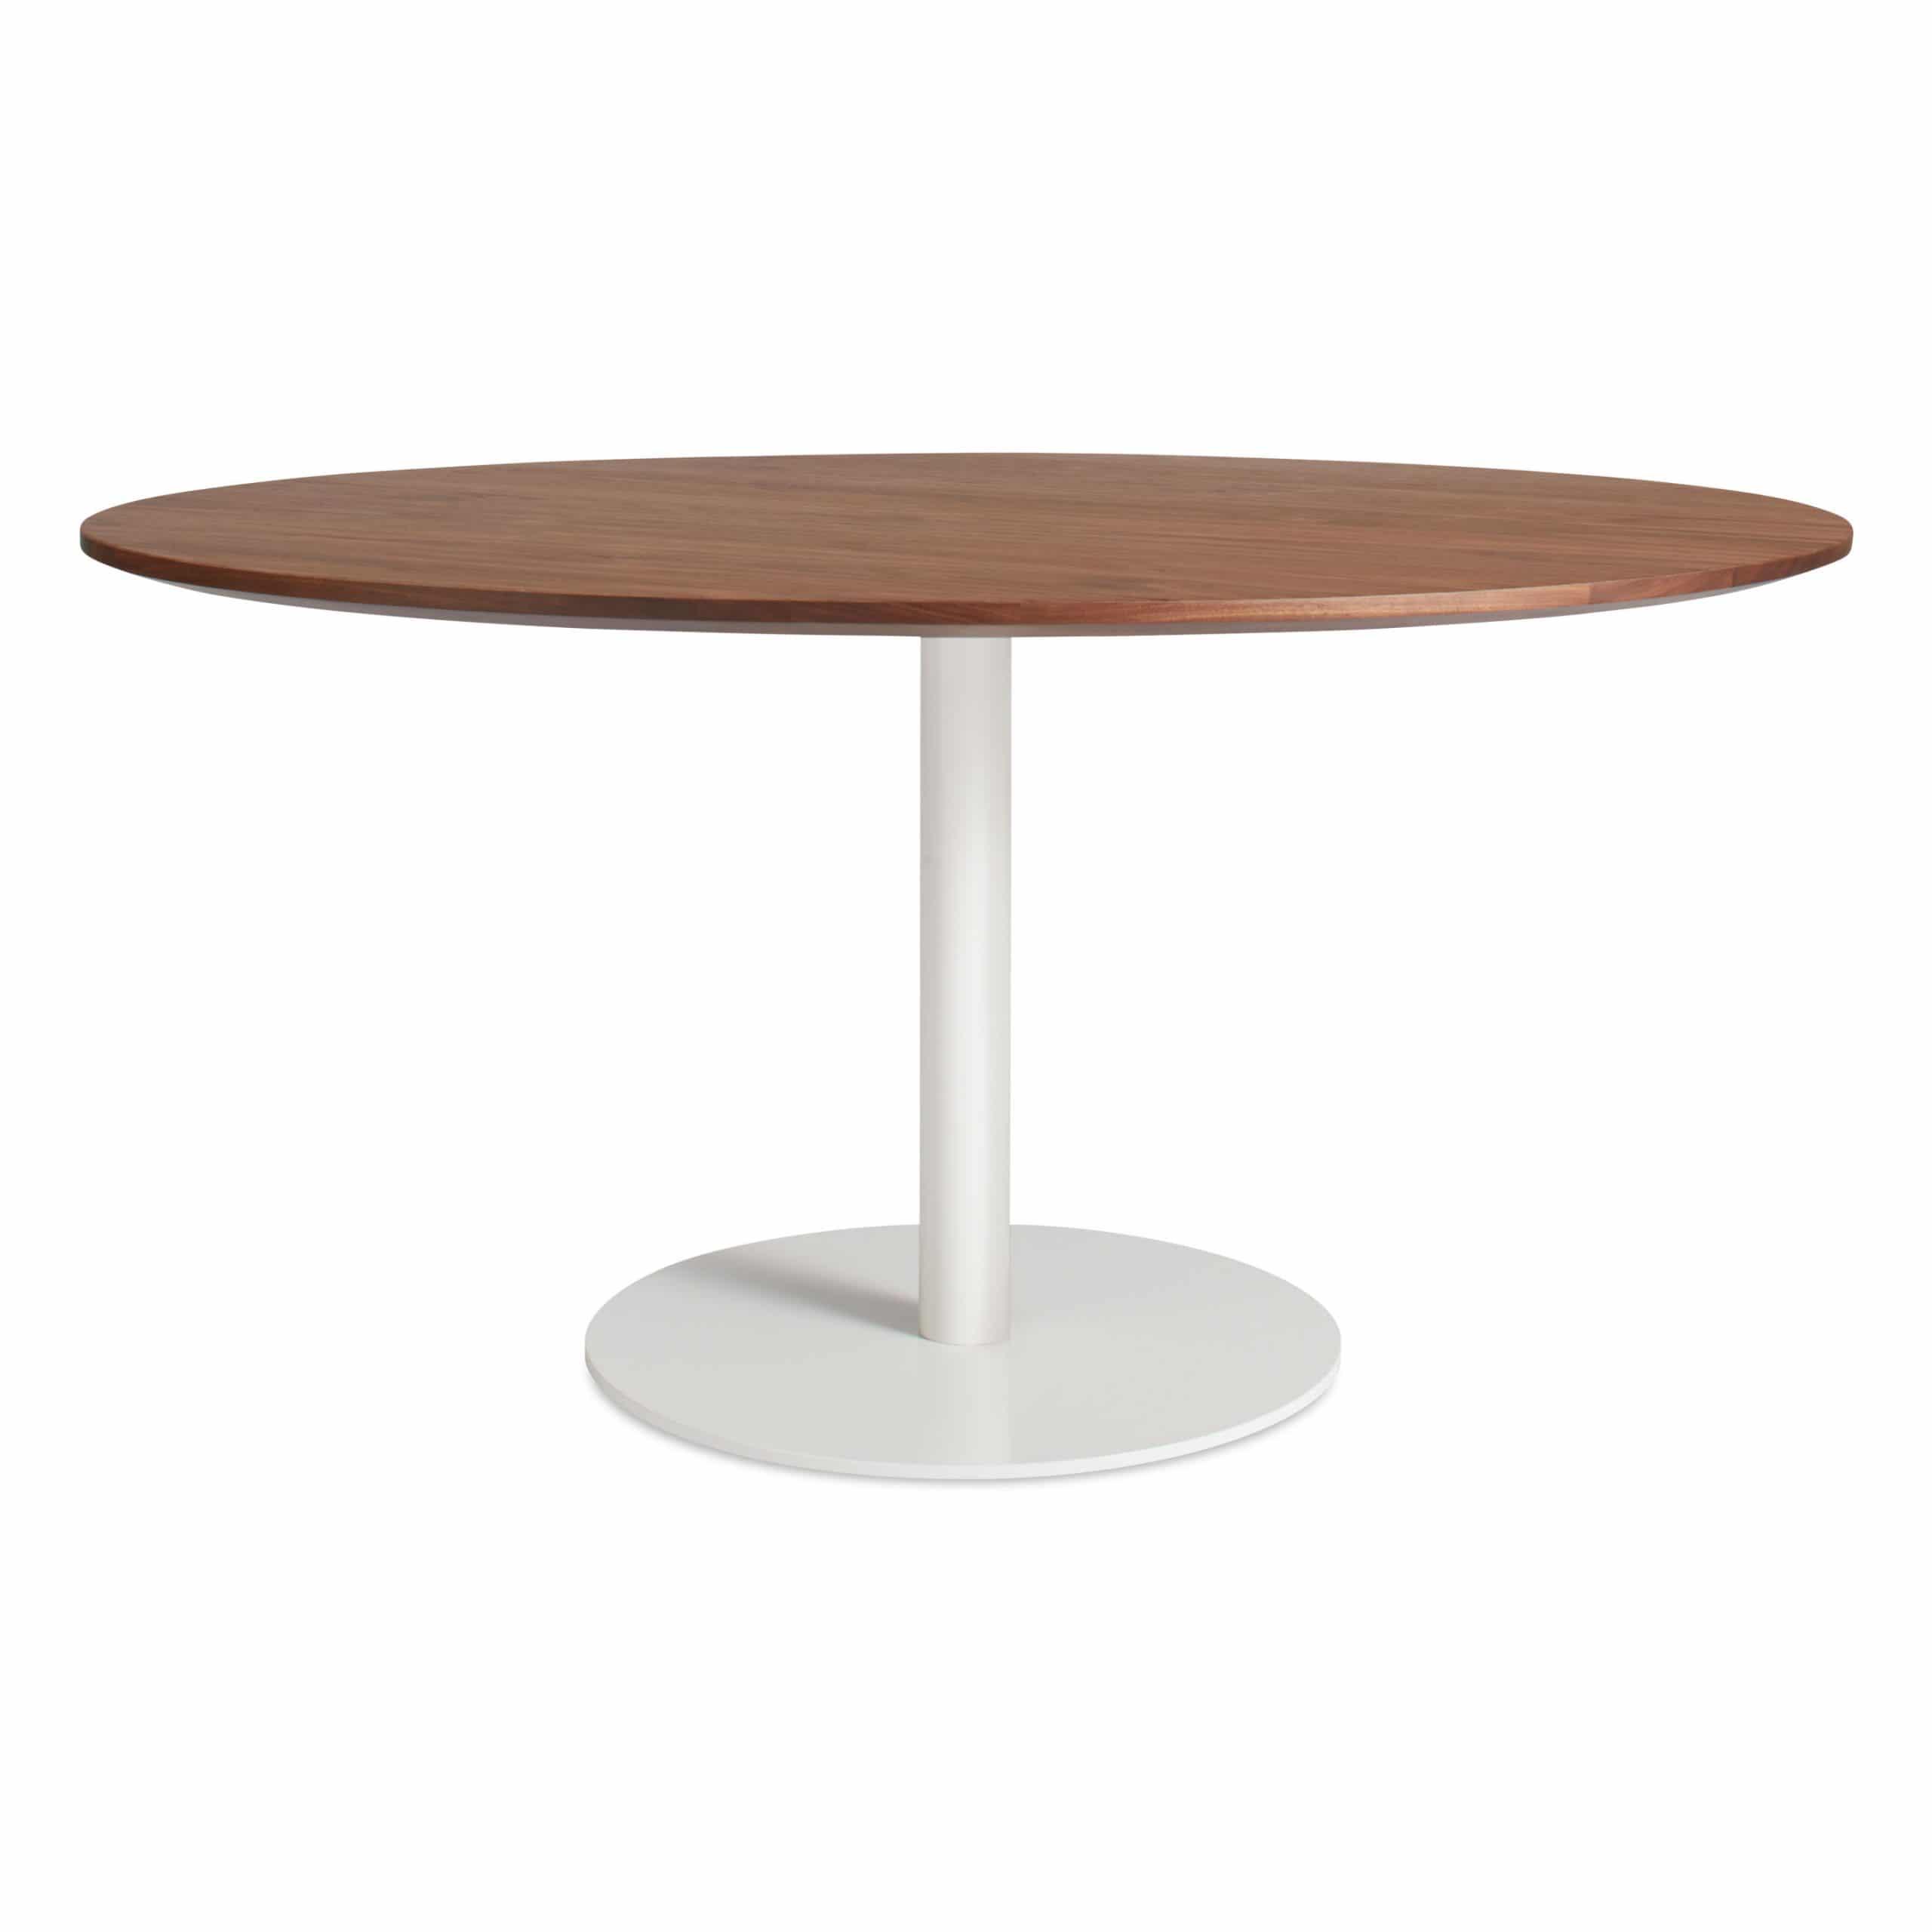 EZ1 LGTBWH WL High Easy Table 60 White